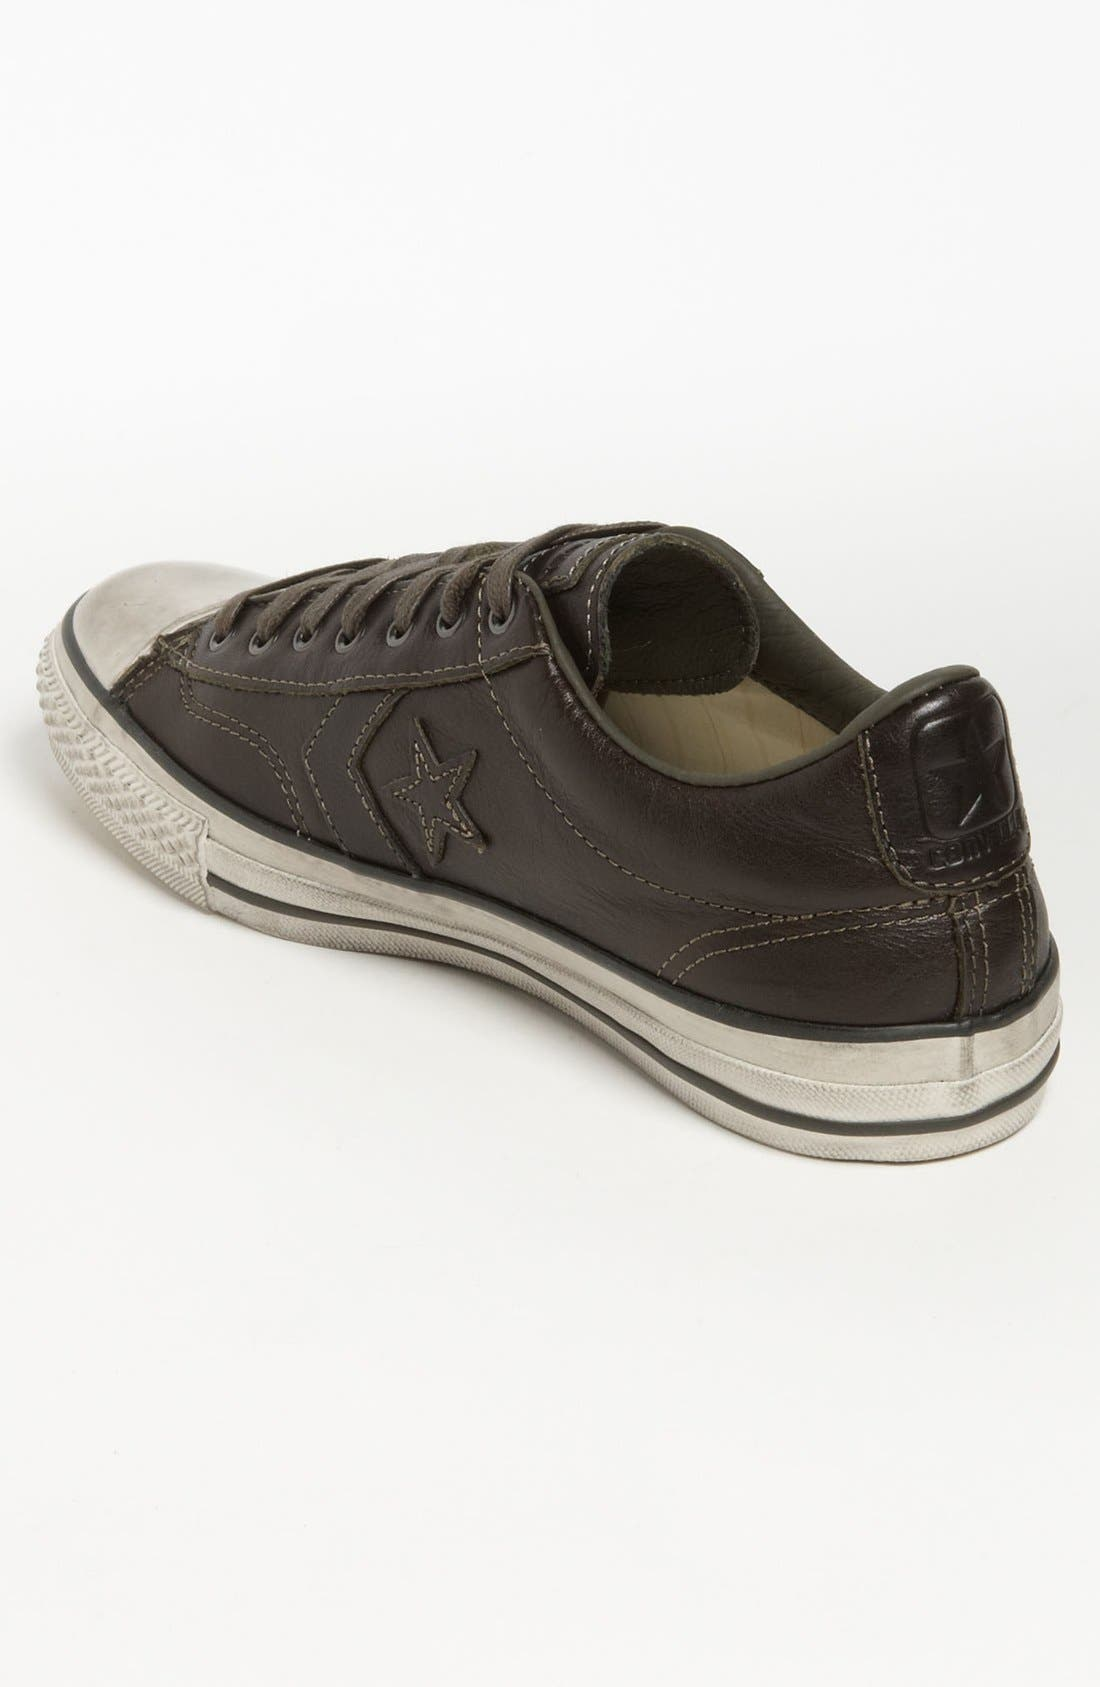 Alternate Image 2  - Converse by John Varvatos 'Star Player' Sneaker (Men)